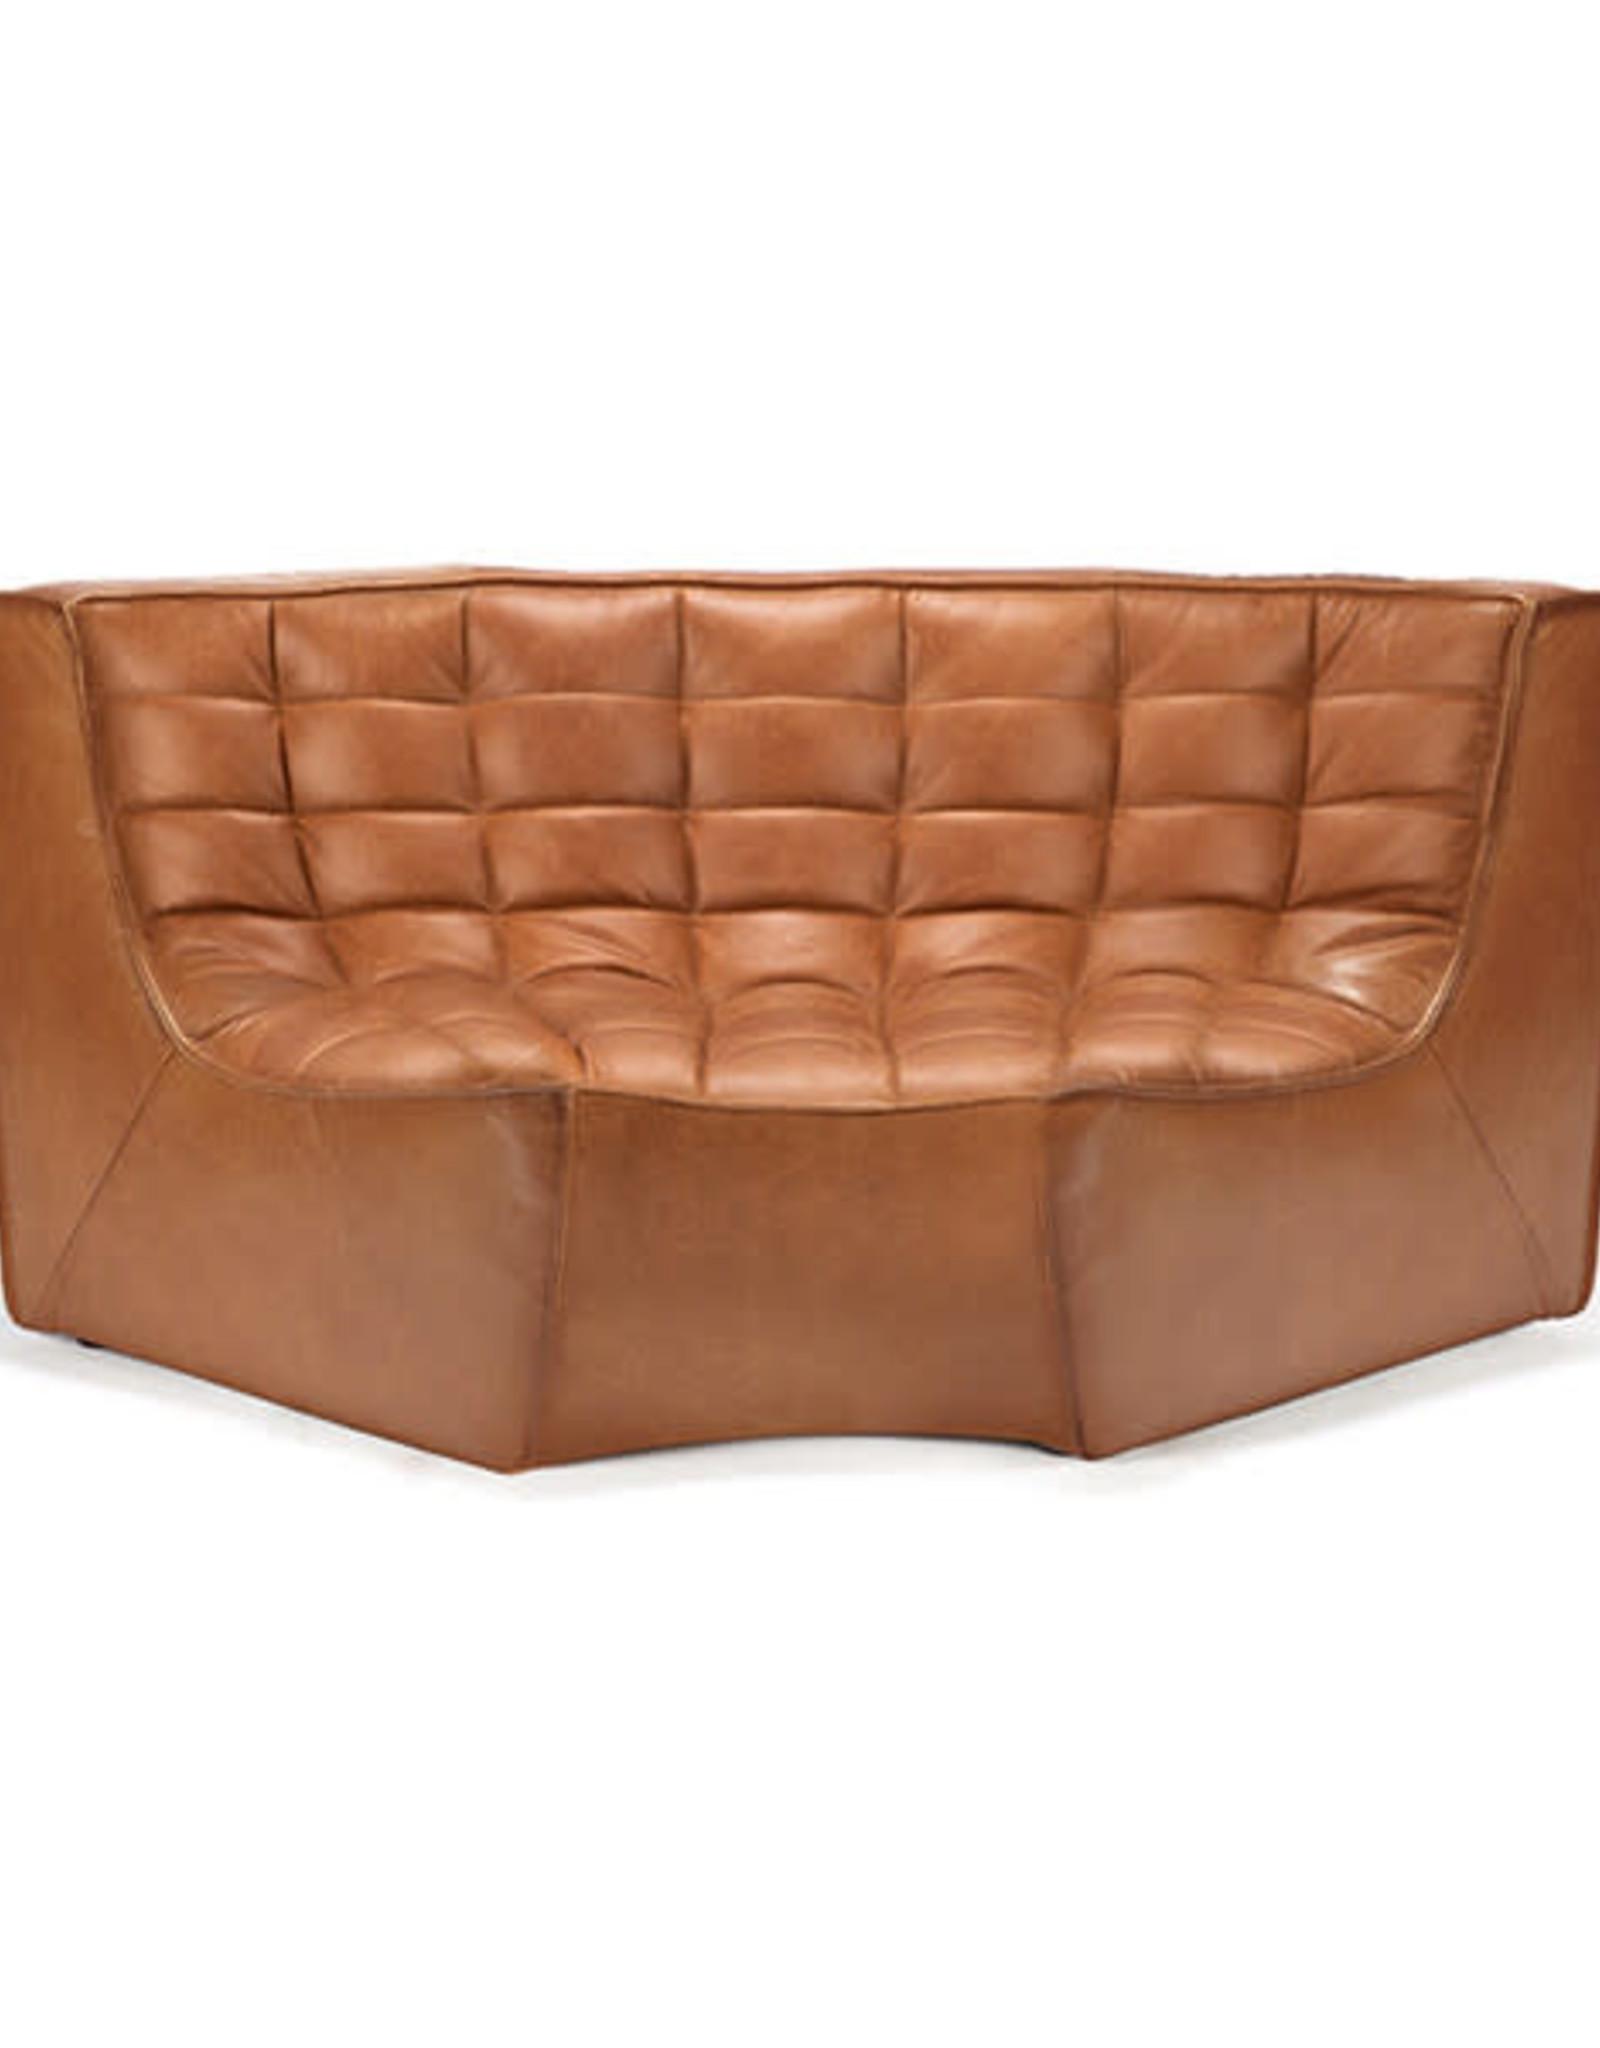 N701 Sofa Round Corner - Old Saddle